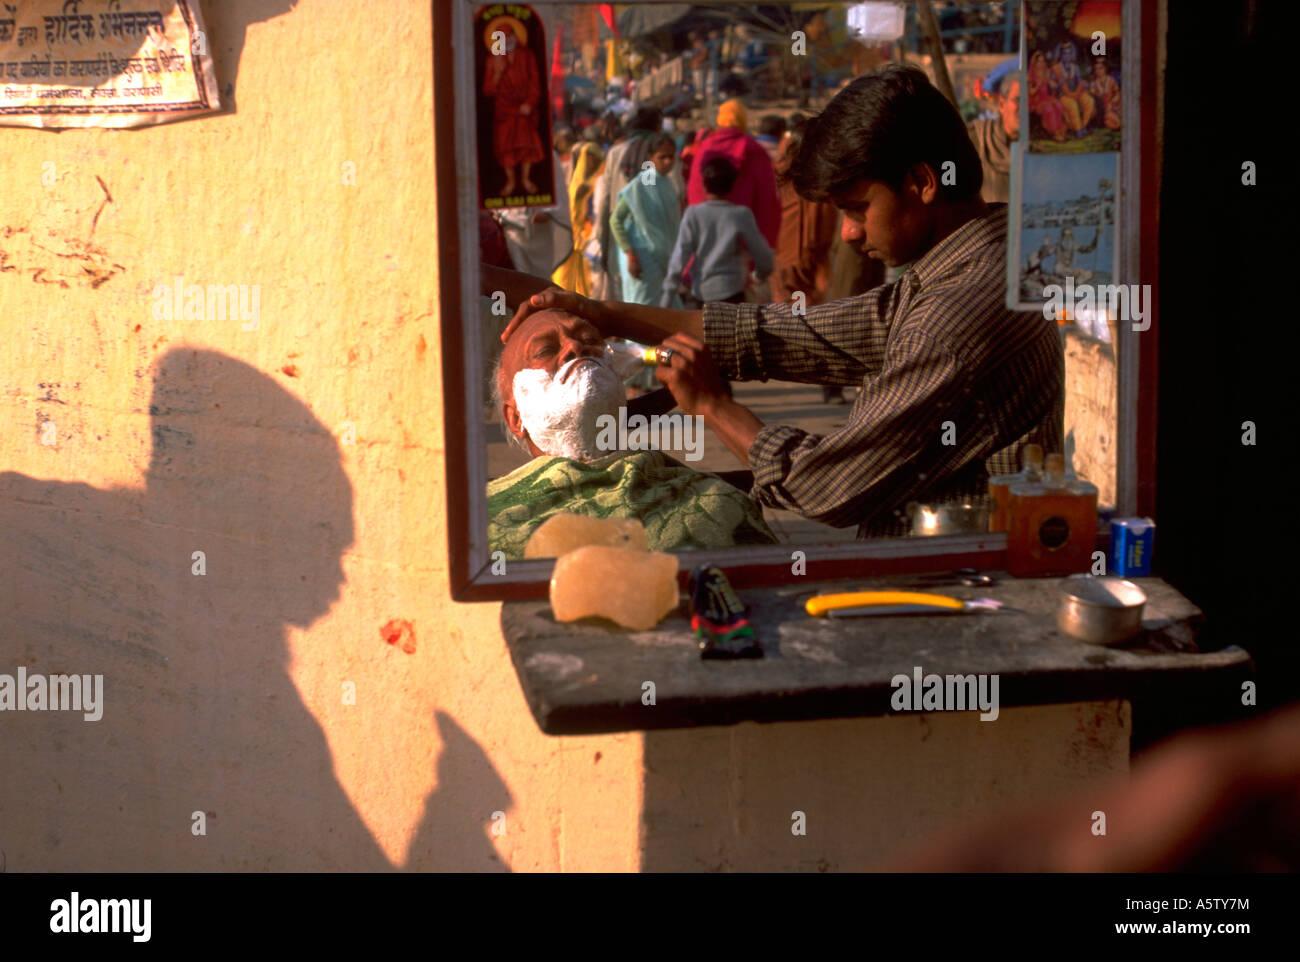 Painet hl1523 barber shop varanasi reflexion mirror hindu shaving client - Stock Image